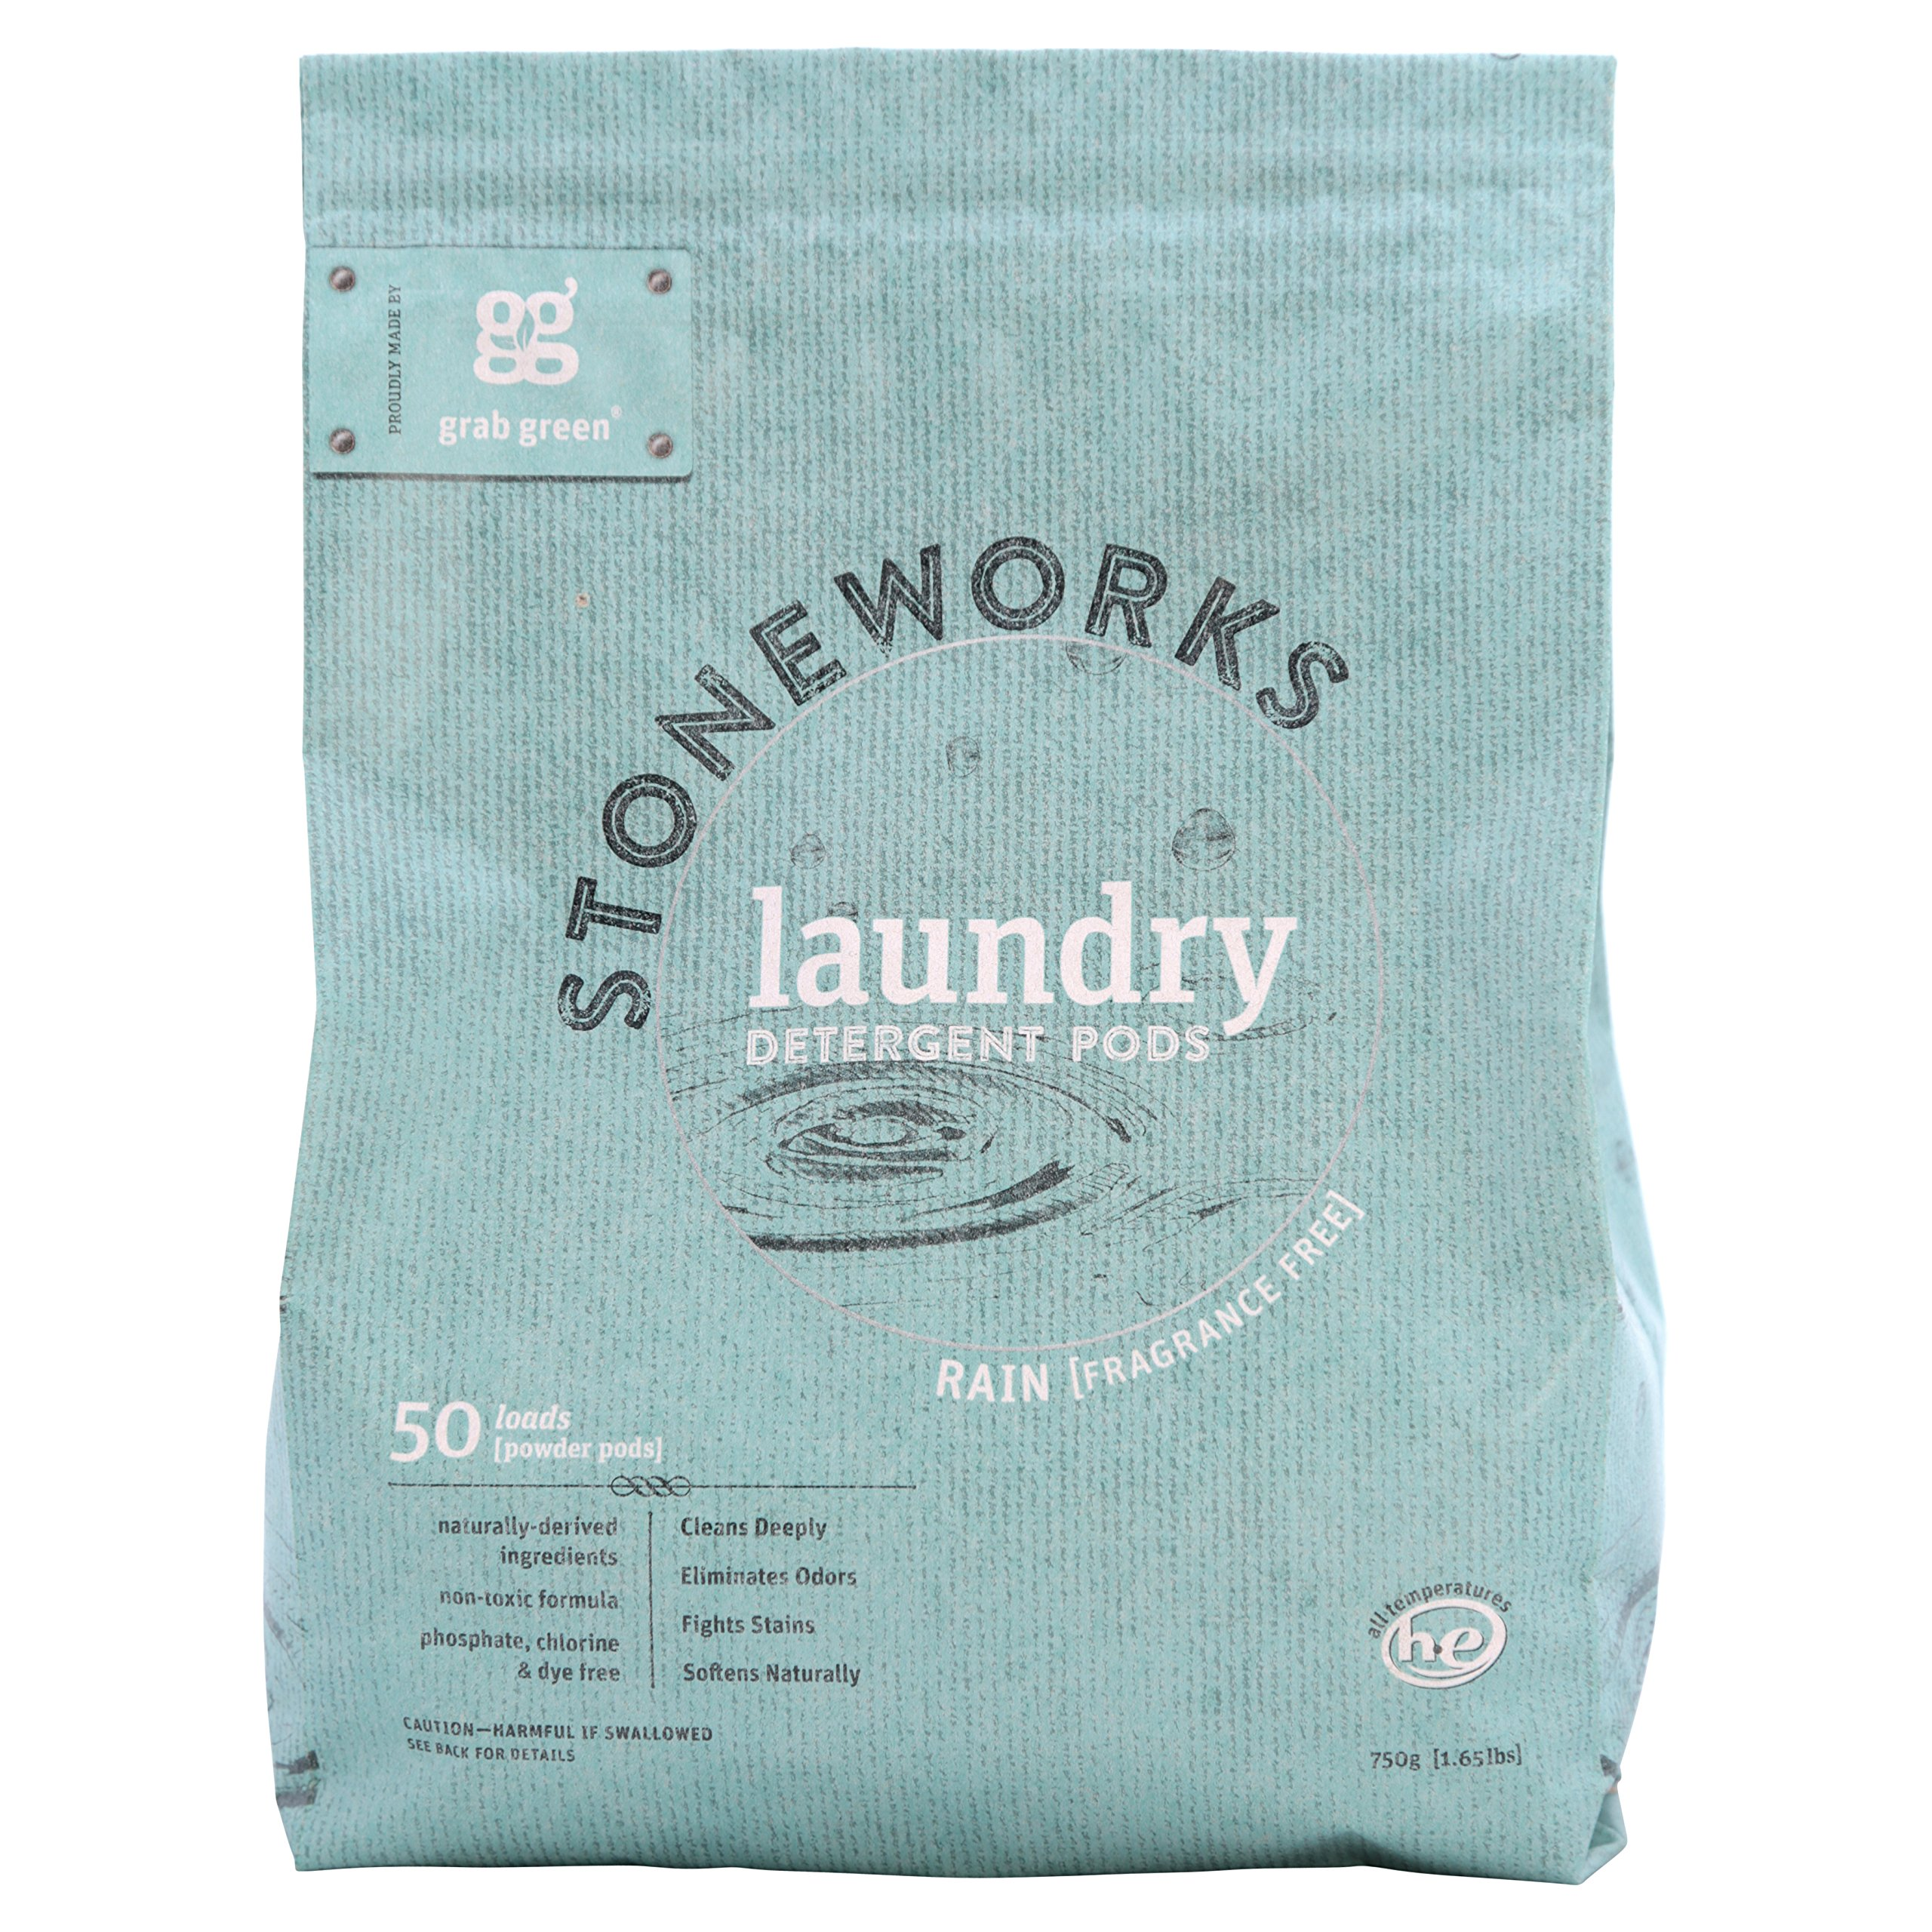 Grab Green Stoneworks Natural Laundry Detergent Powder Pods, Rain (Fragrance Free), 50 loads